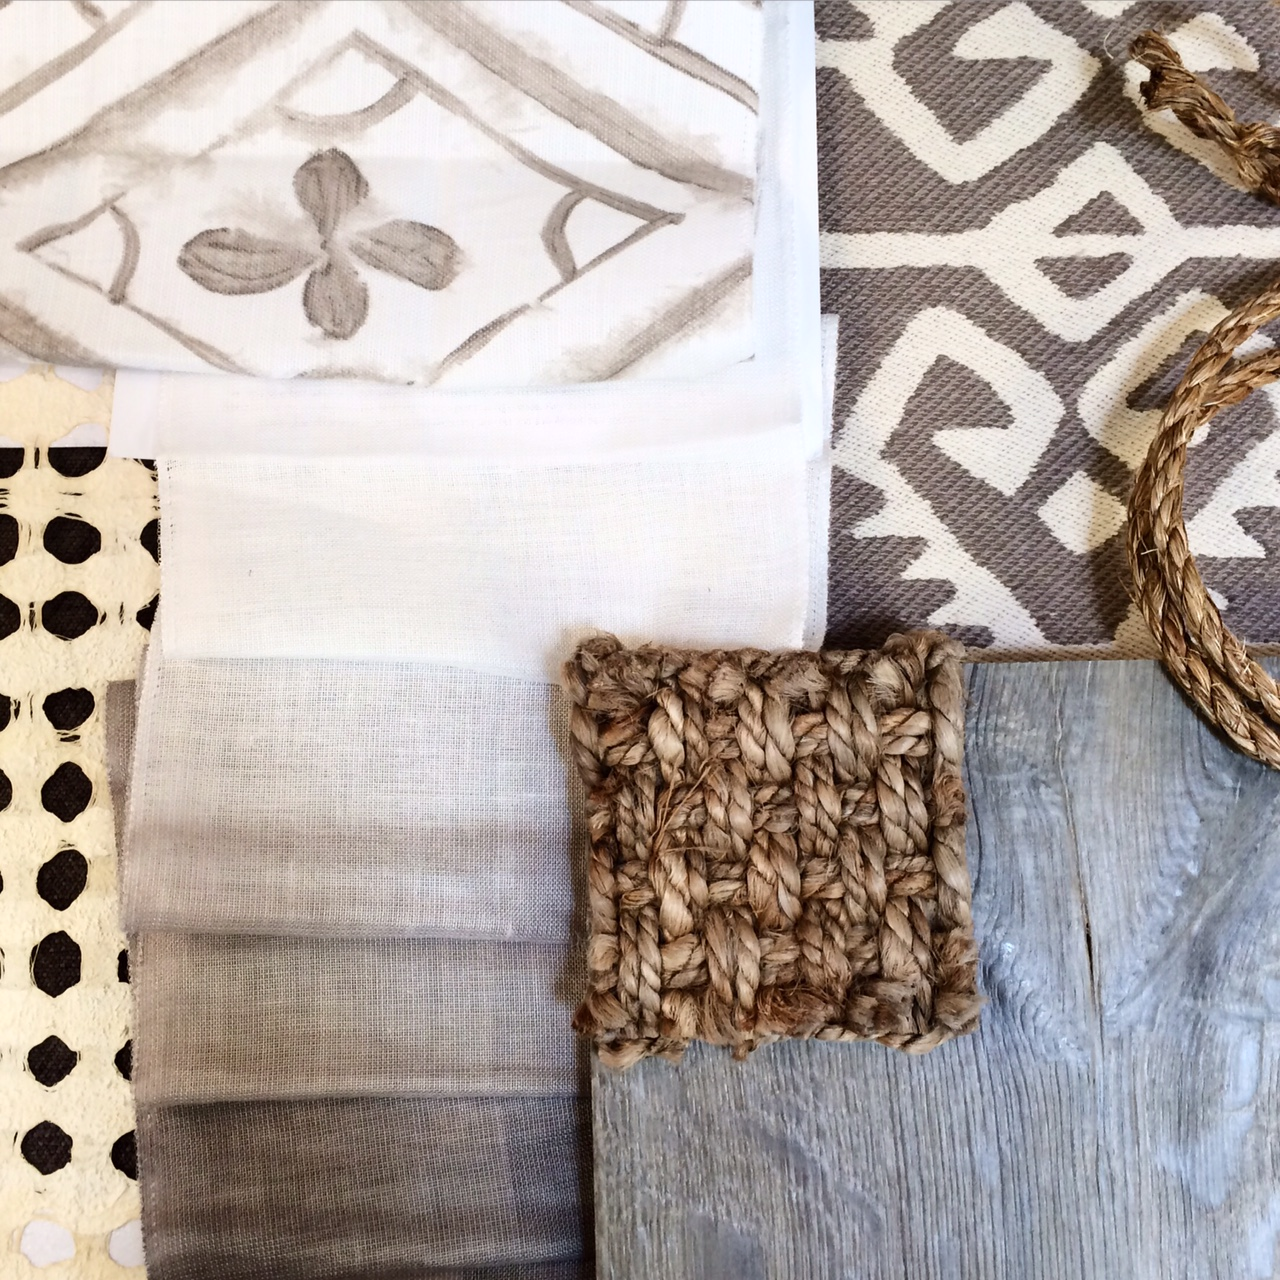 Interior design firm serving Santa Fe, Aspen, and Scottsdale